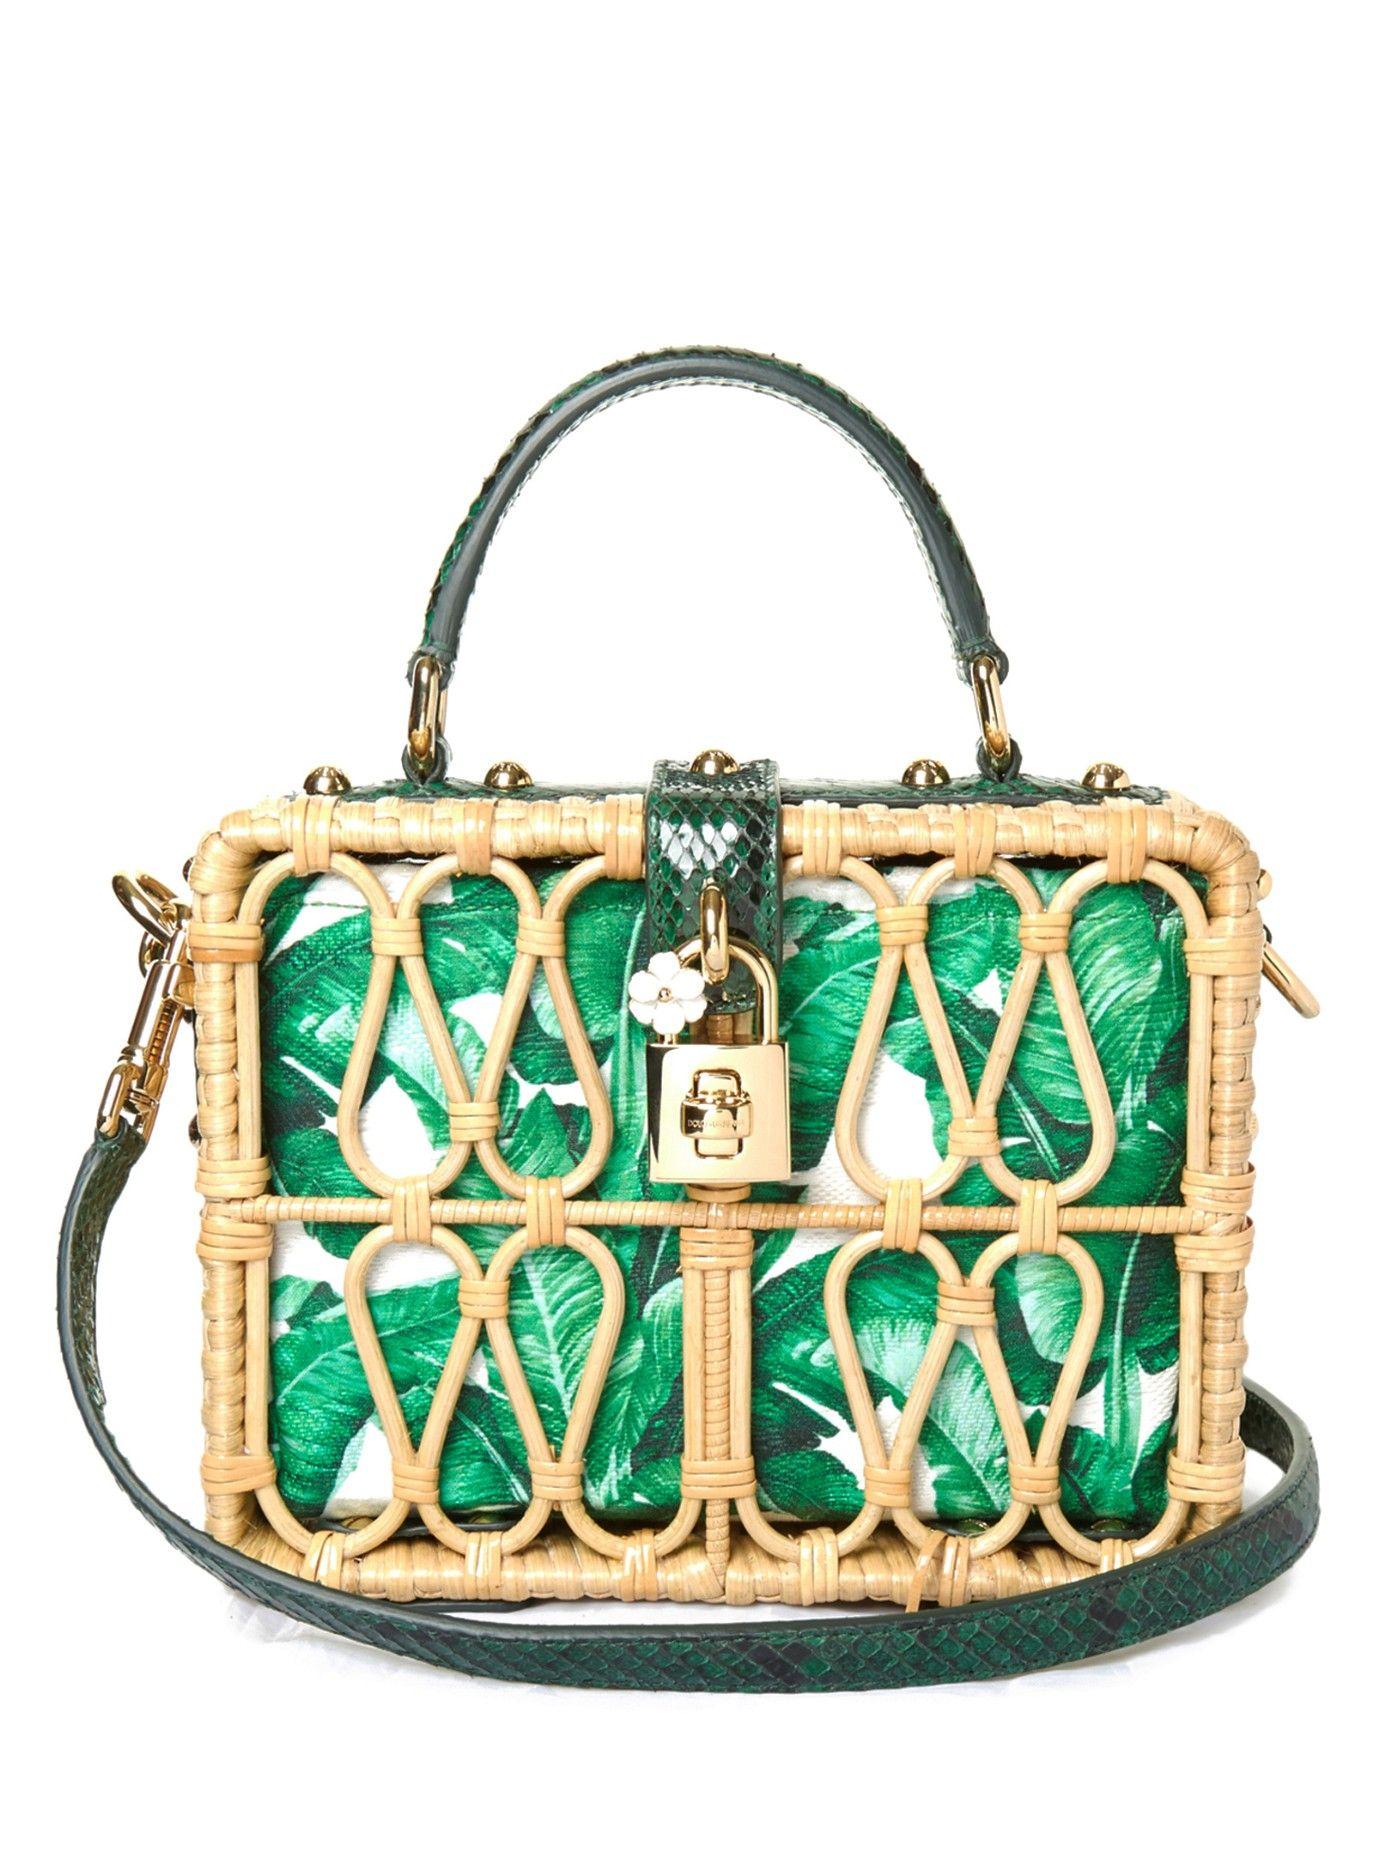 768094af0f Banana leaf-print leather and wicker box bag | Dolce & Gabbana |  MATCHESFASHION.COM UK